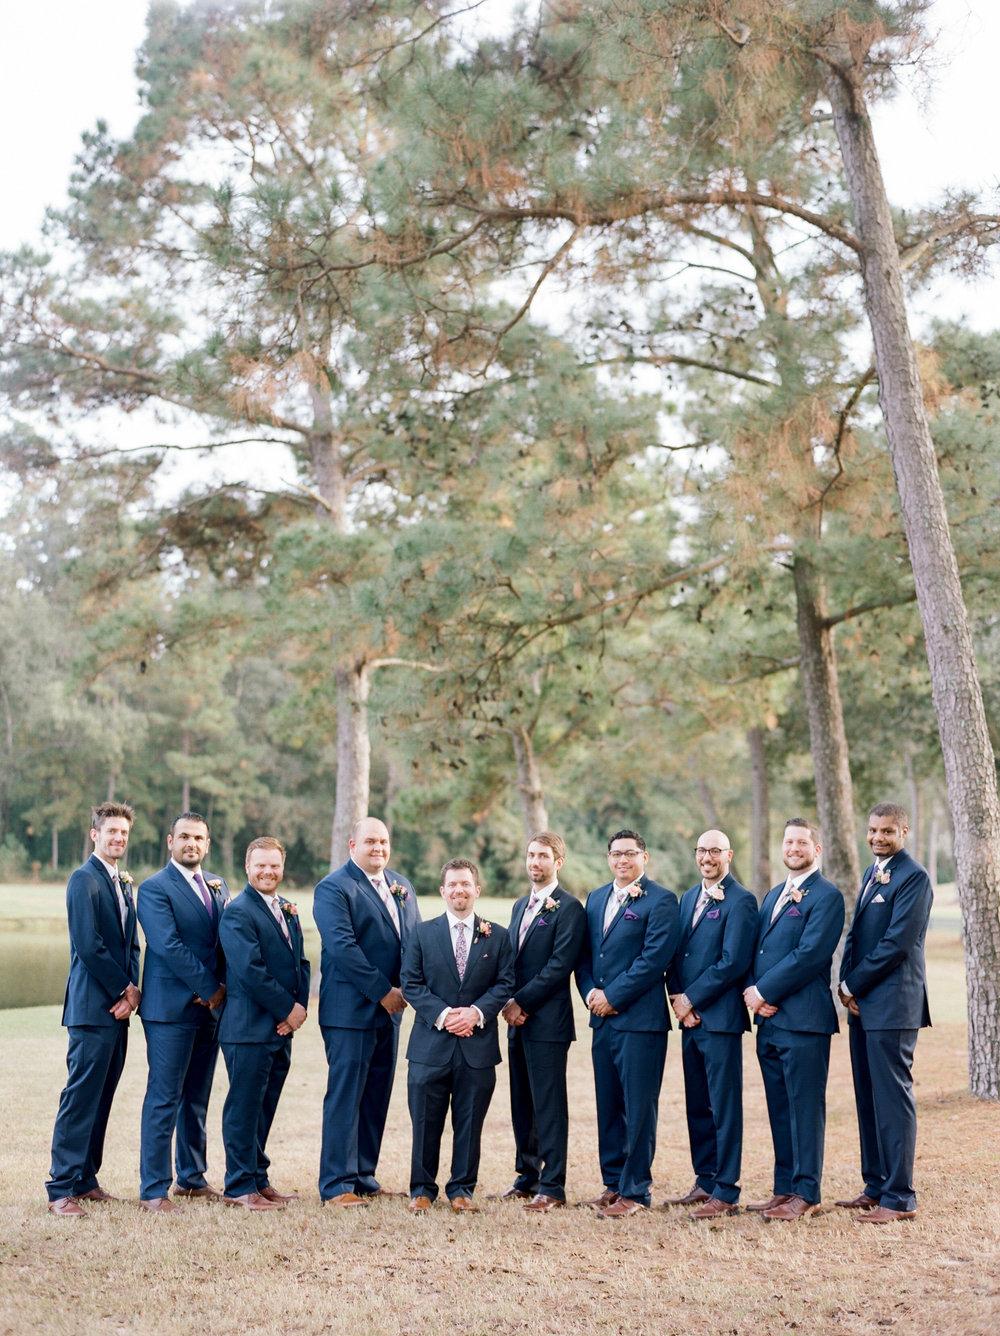 Houston-Wedding-Photographer-Fine-Art-Film-Destination-Style-Me-Pretty-Austin-Dallas-New-Orleans-Dana-Fernandez-Photography-The Woodlands-Country-Club-8.jpg